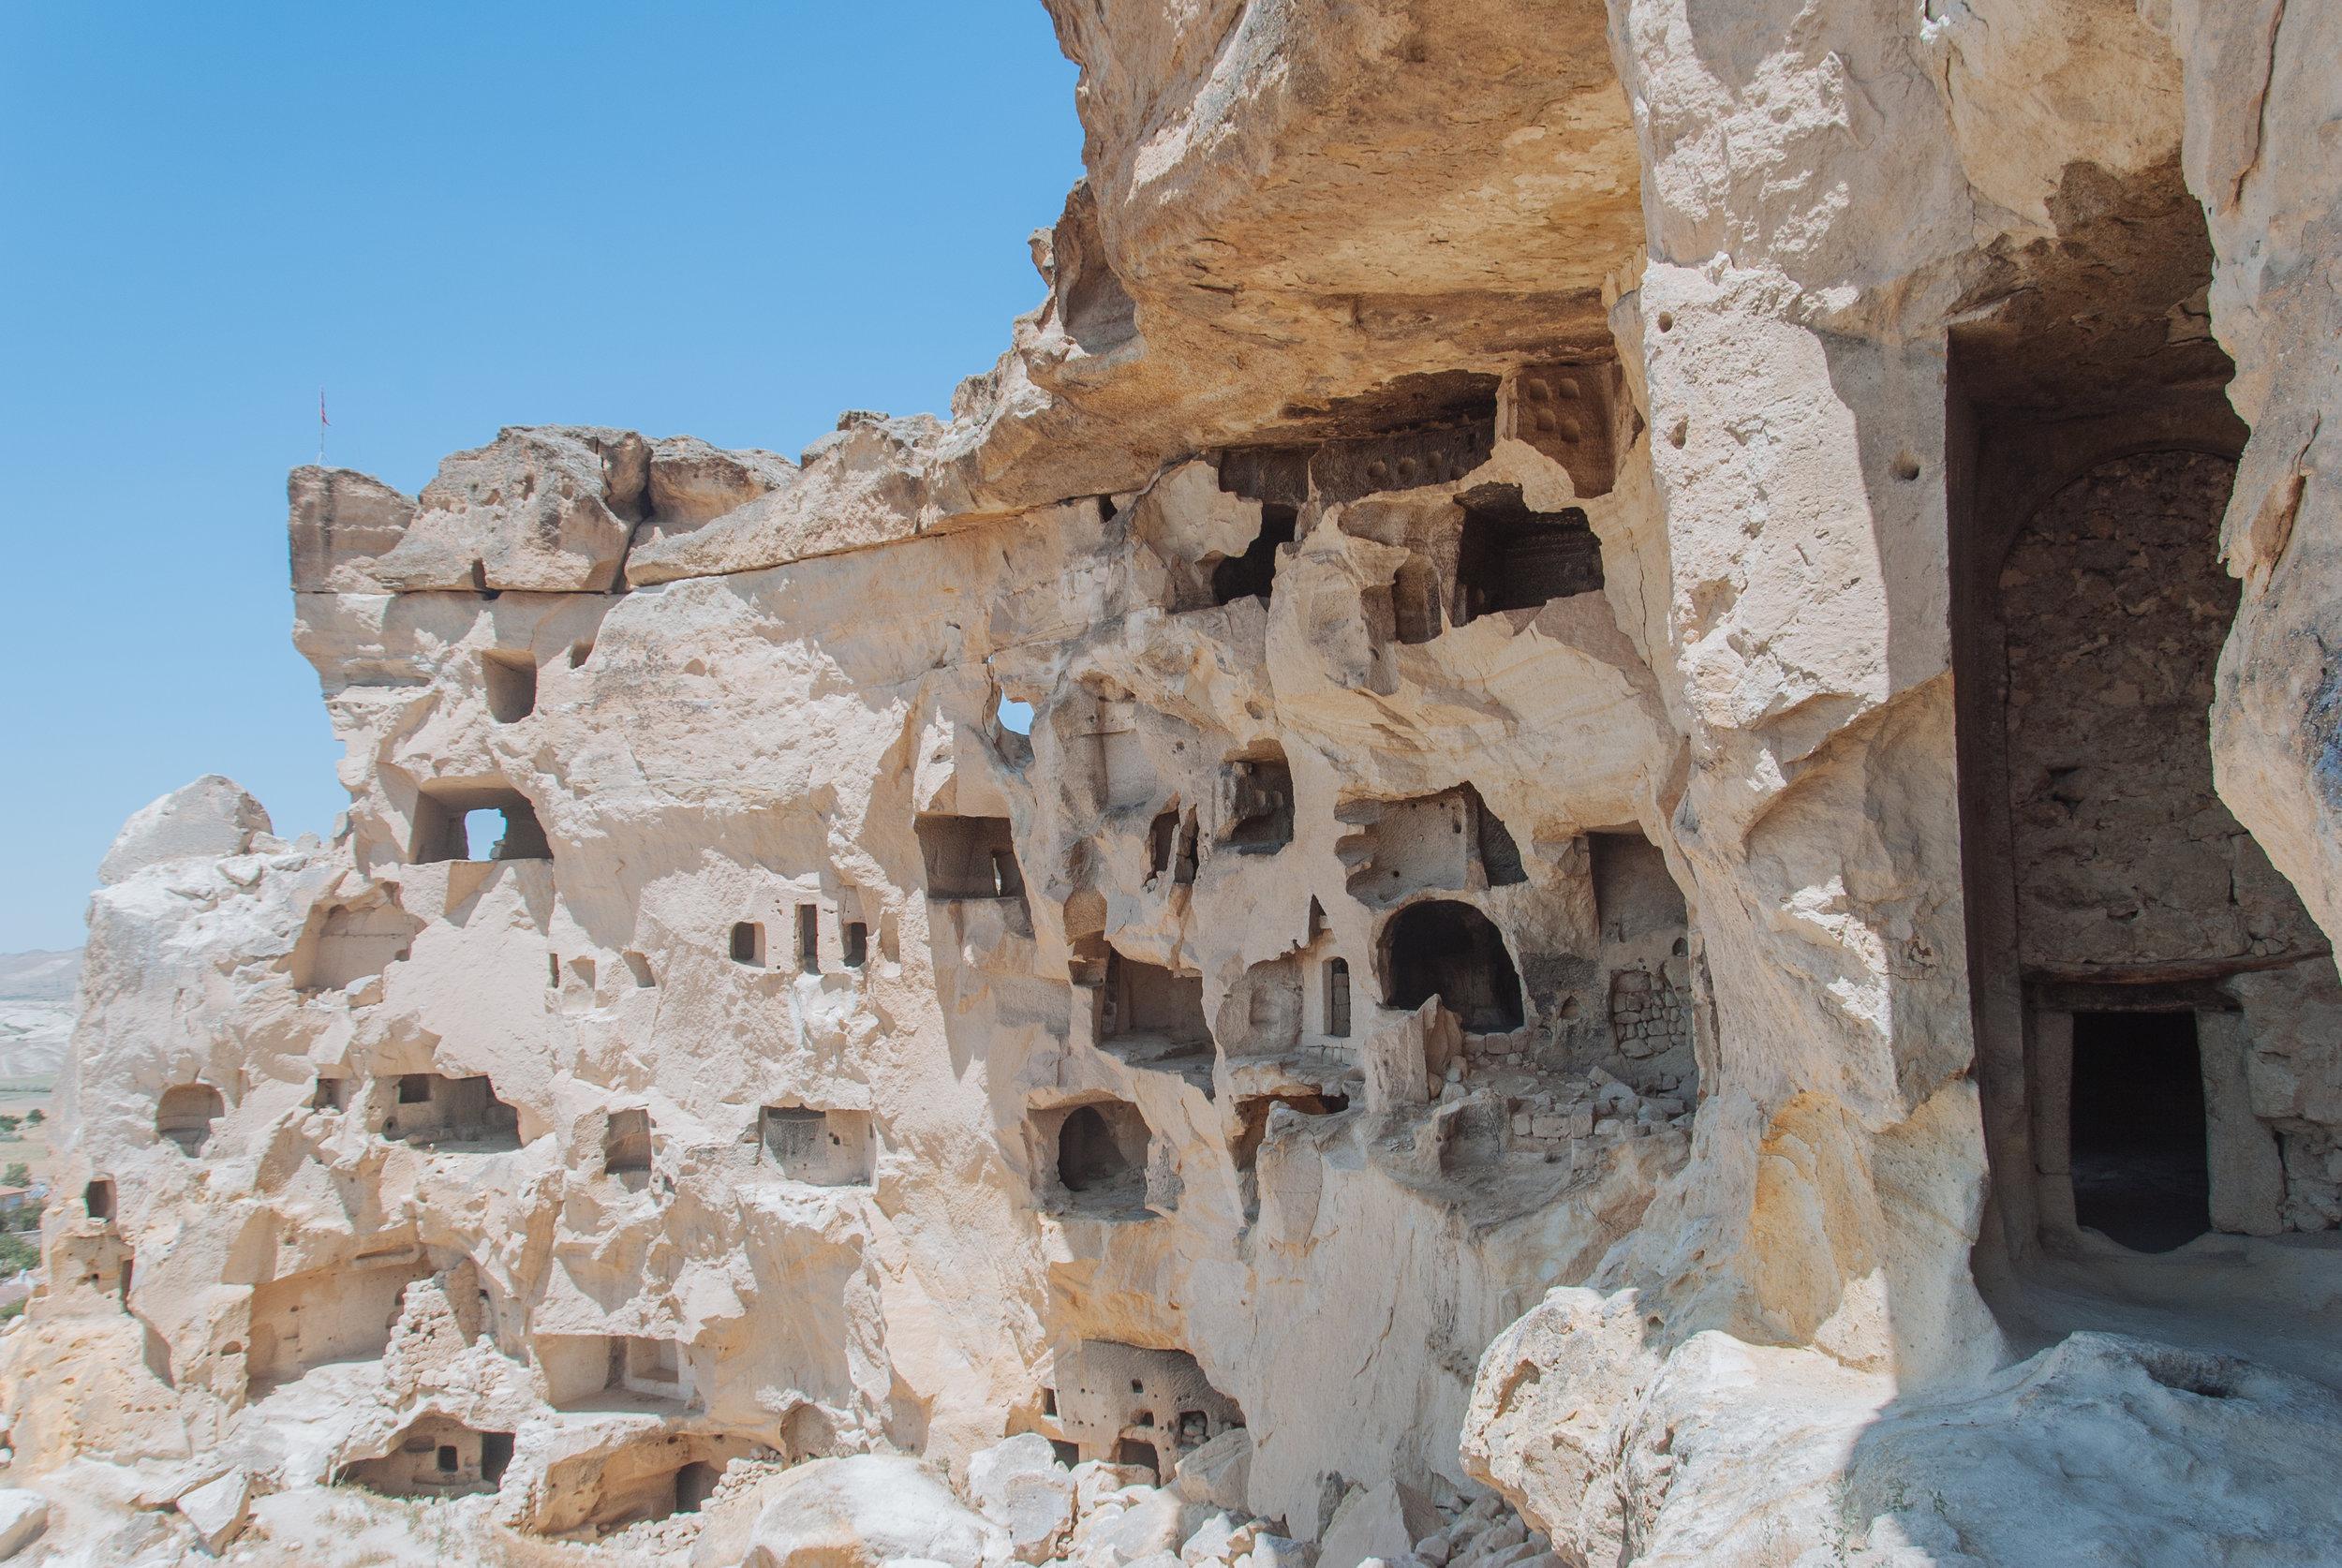 Ancient cavetown near Goreme